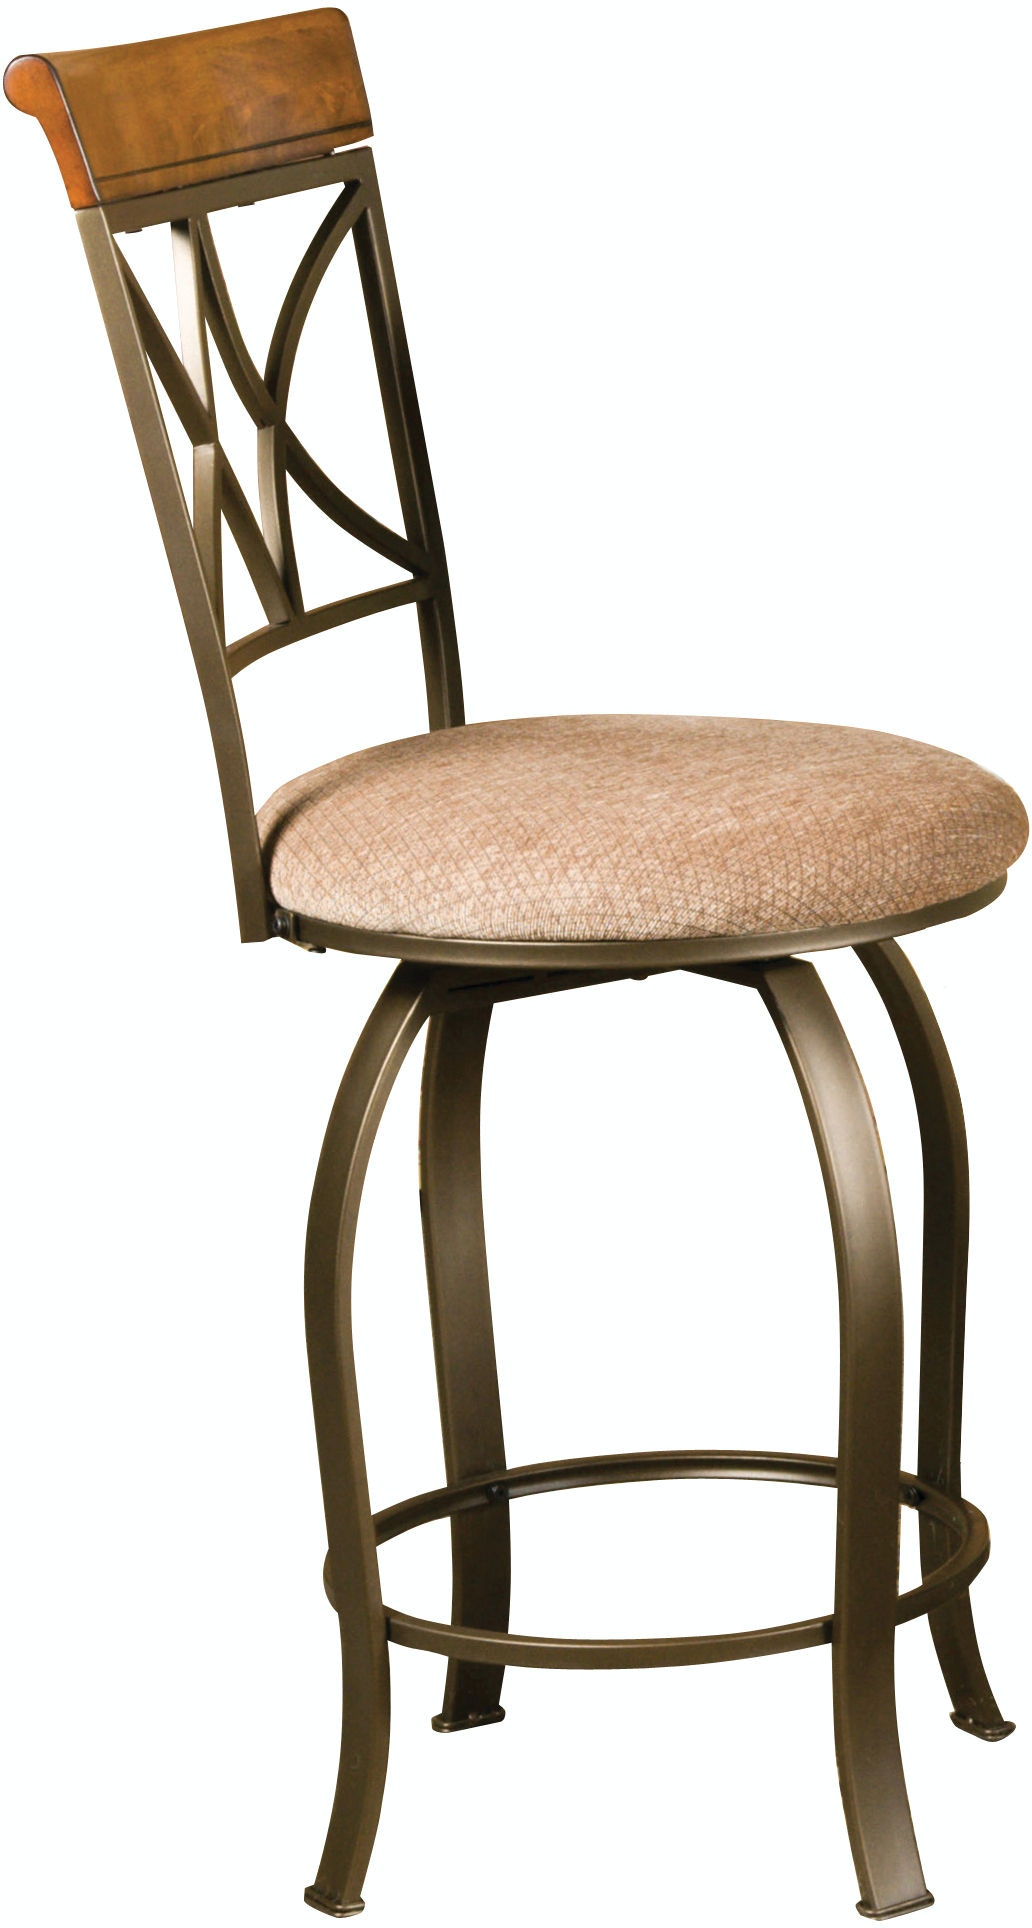 Powell Furniture Dining Room Hamilton Swivel Counter Stool  : 697 726silo from www.bosticsugg.com size 1024 x 768 jpeg 27kB